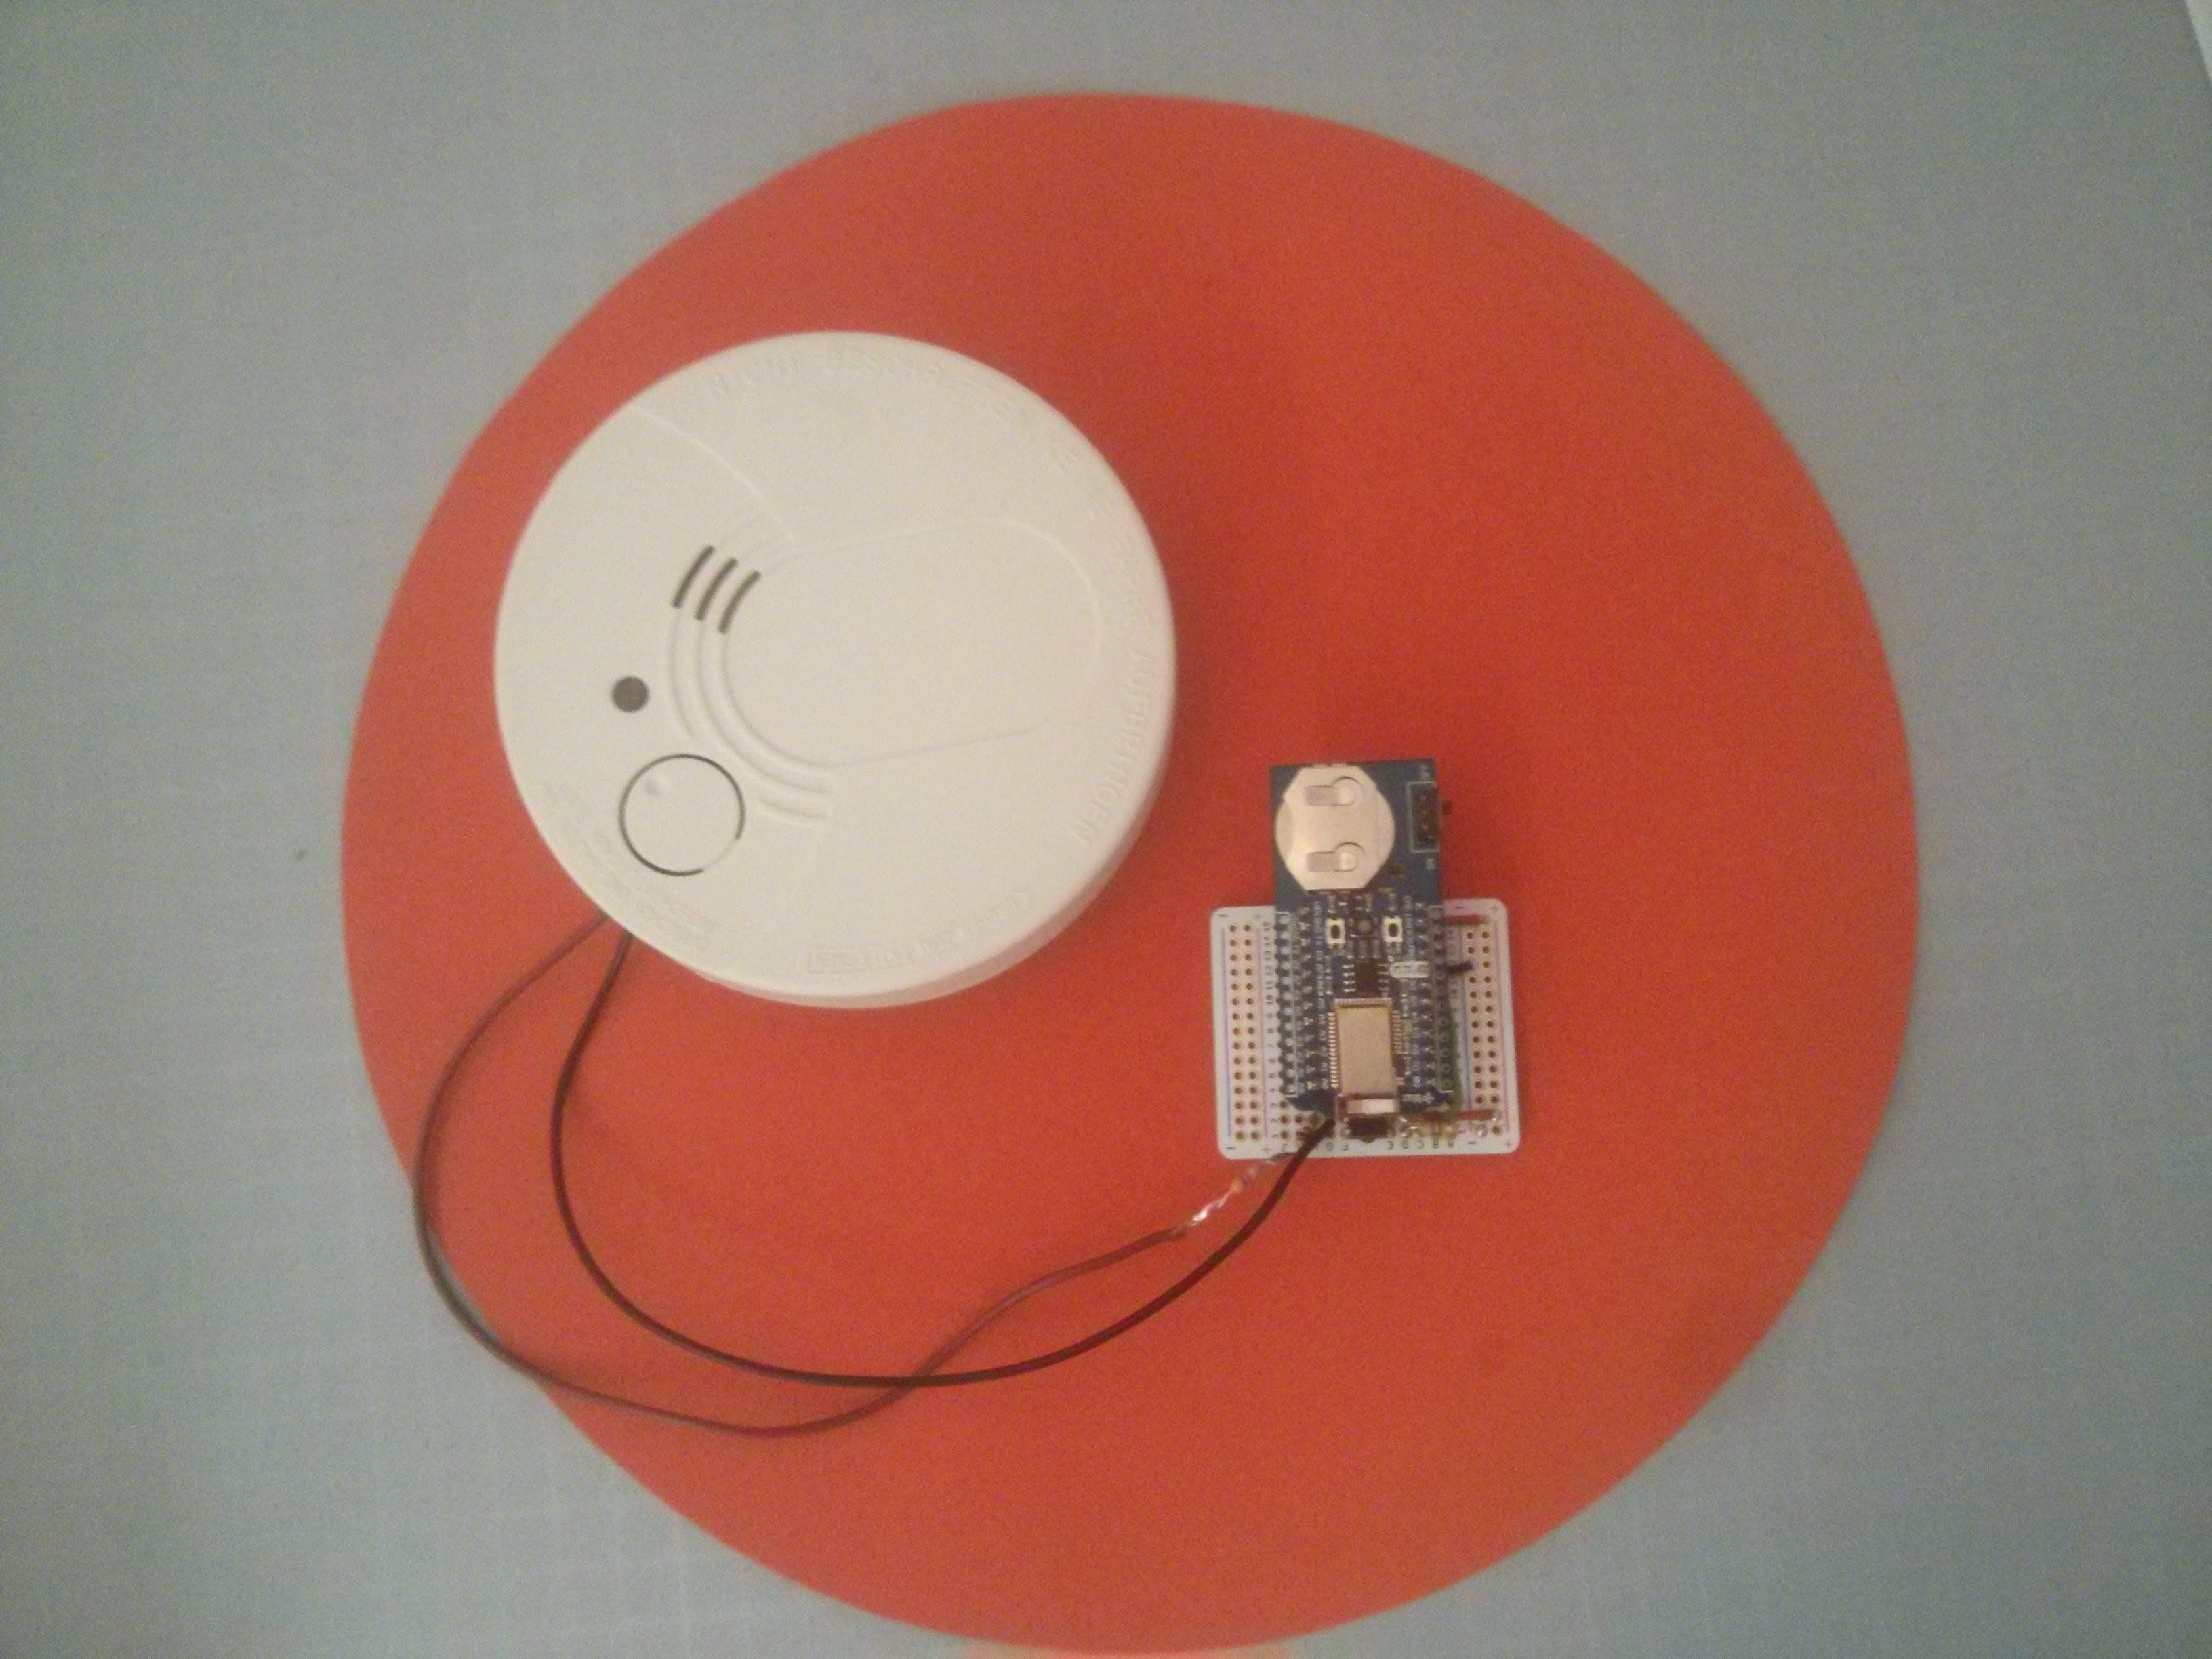 Bluz DK IoT smoke detector